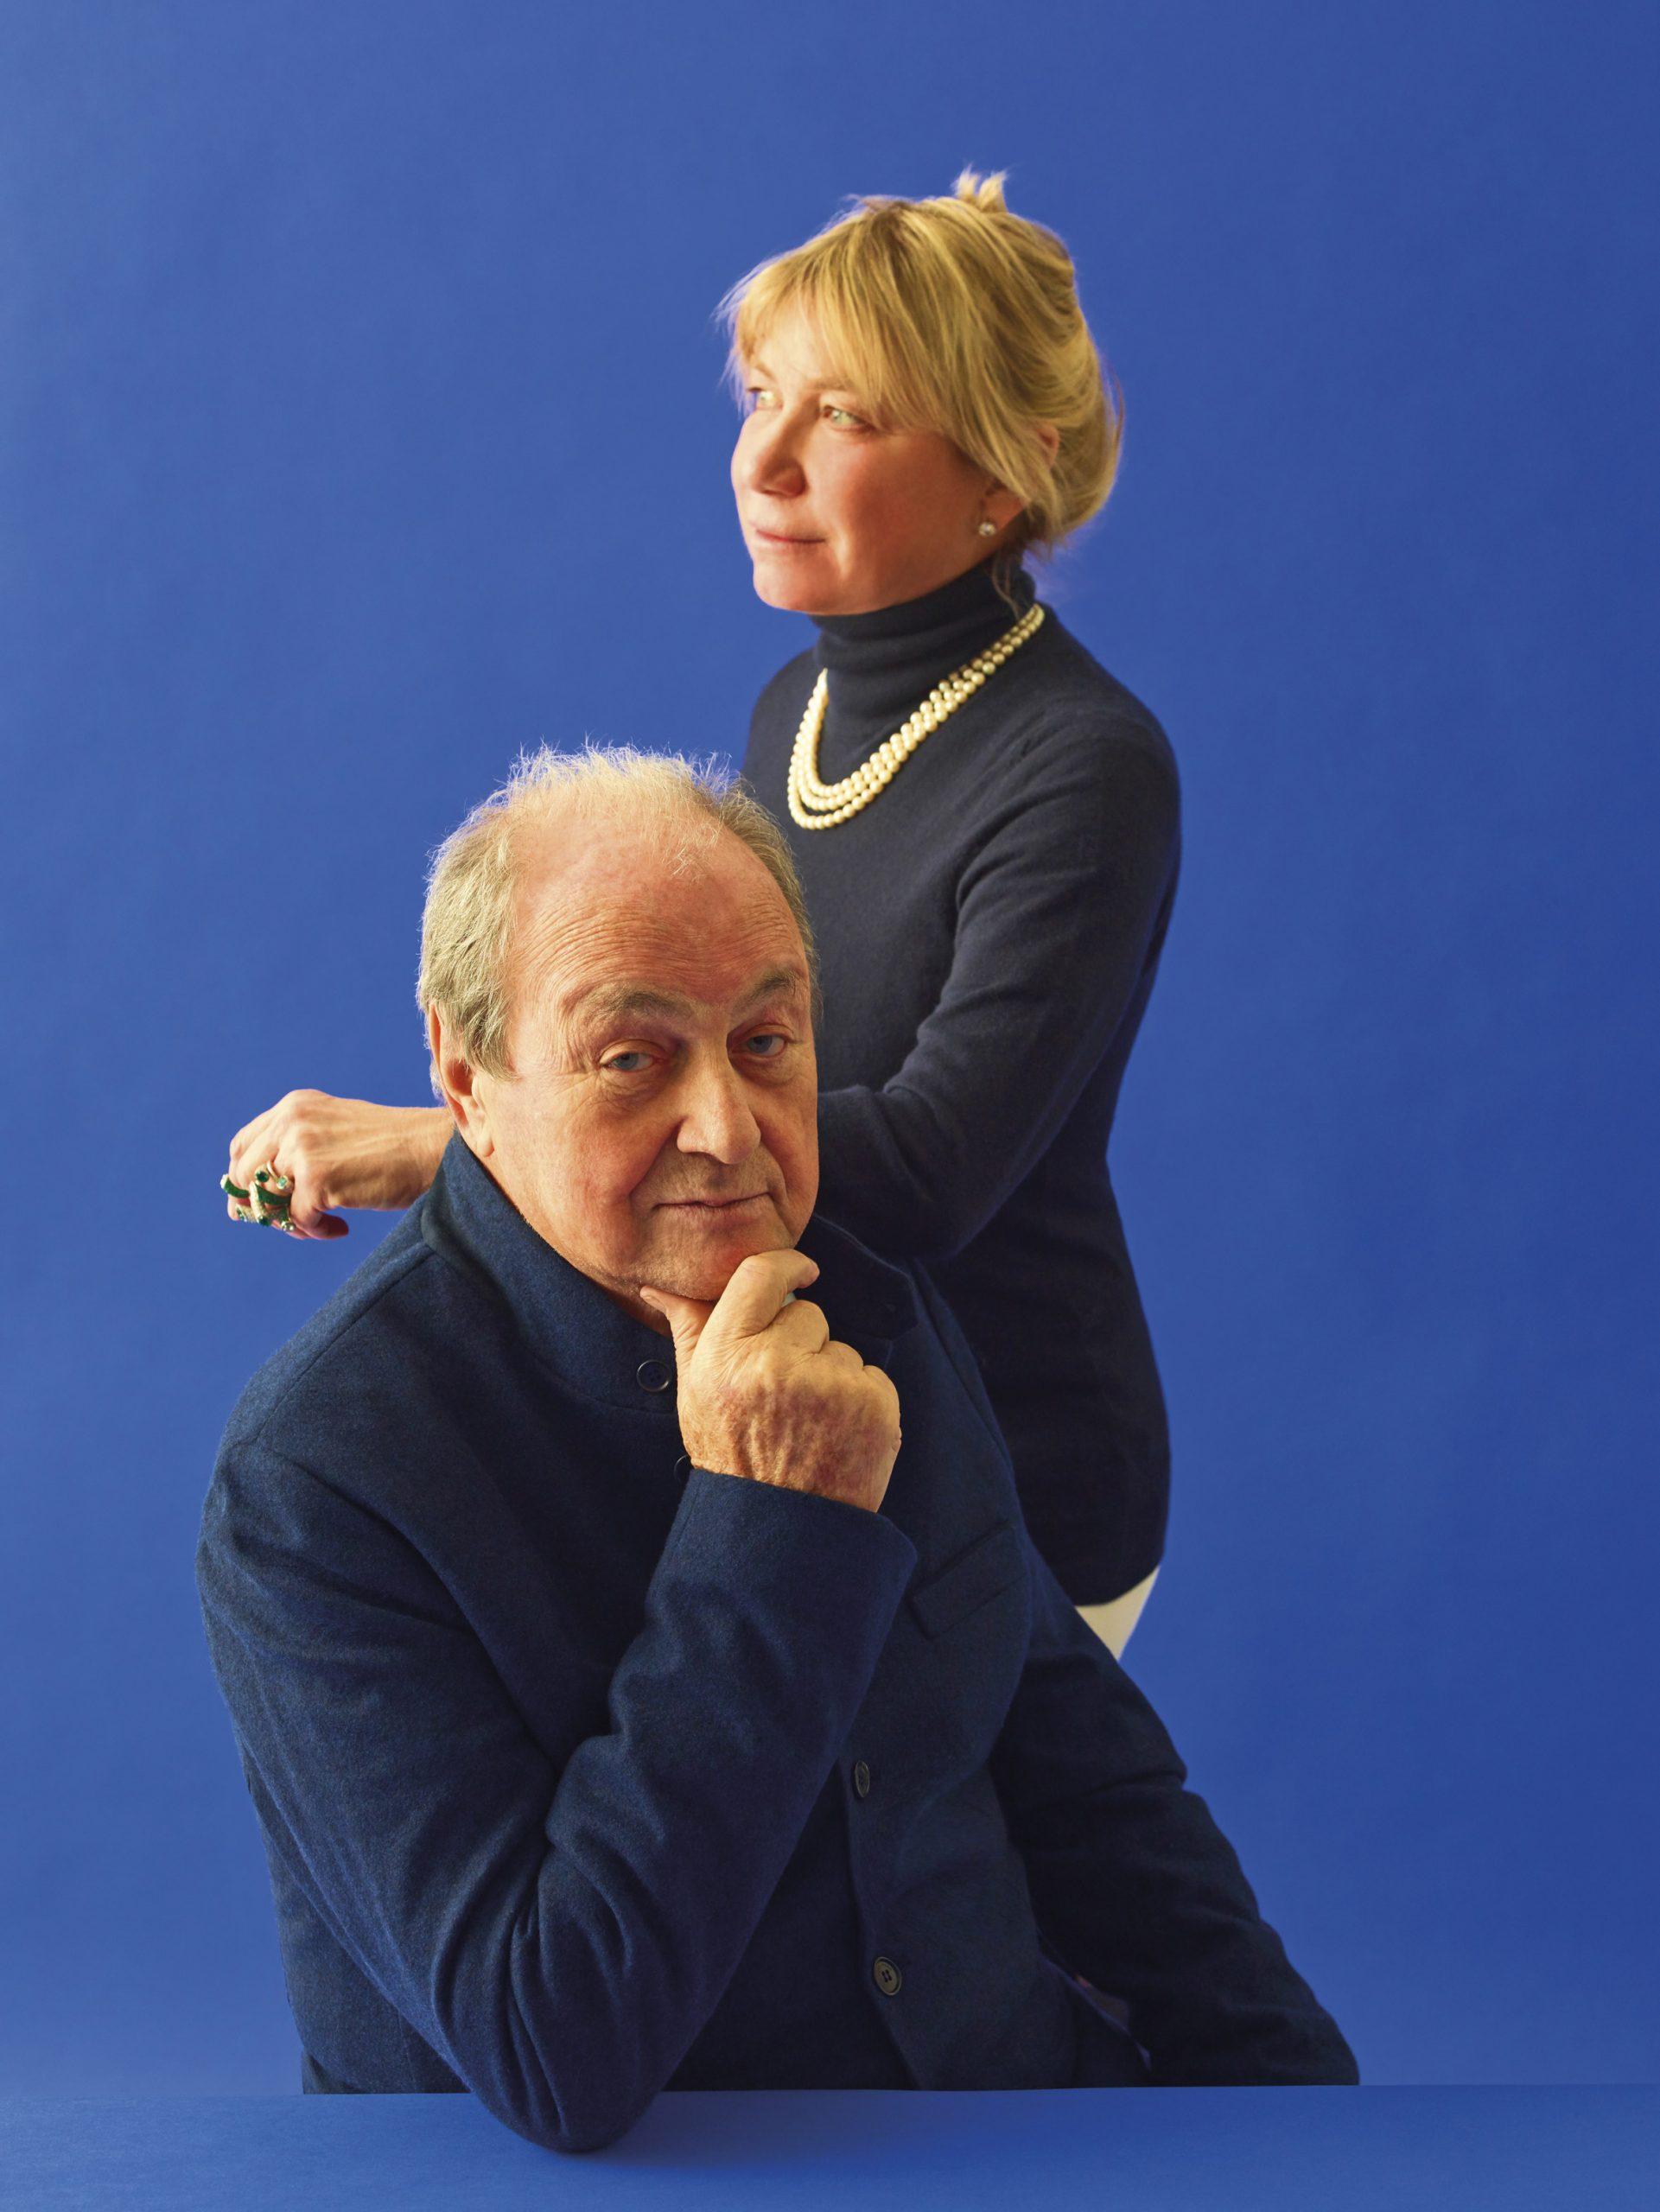 Ernesto Gismondi and Carlotta de Bevilacqua